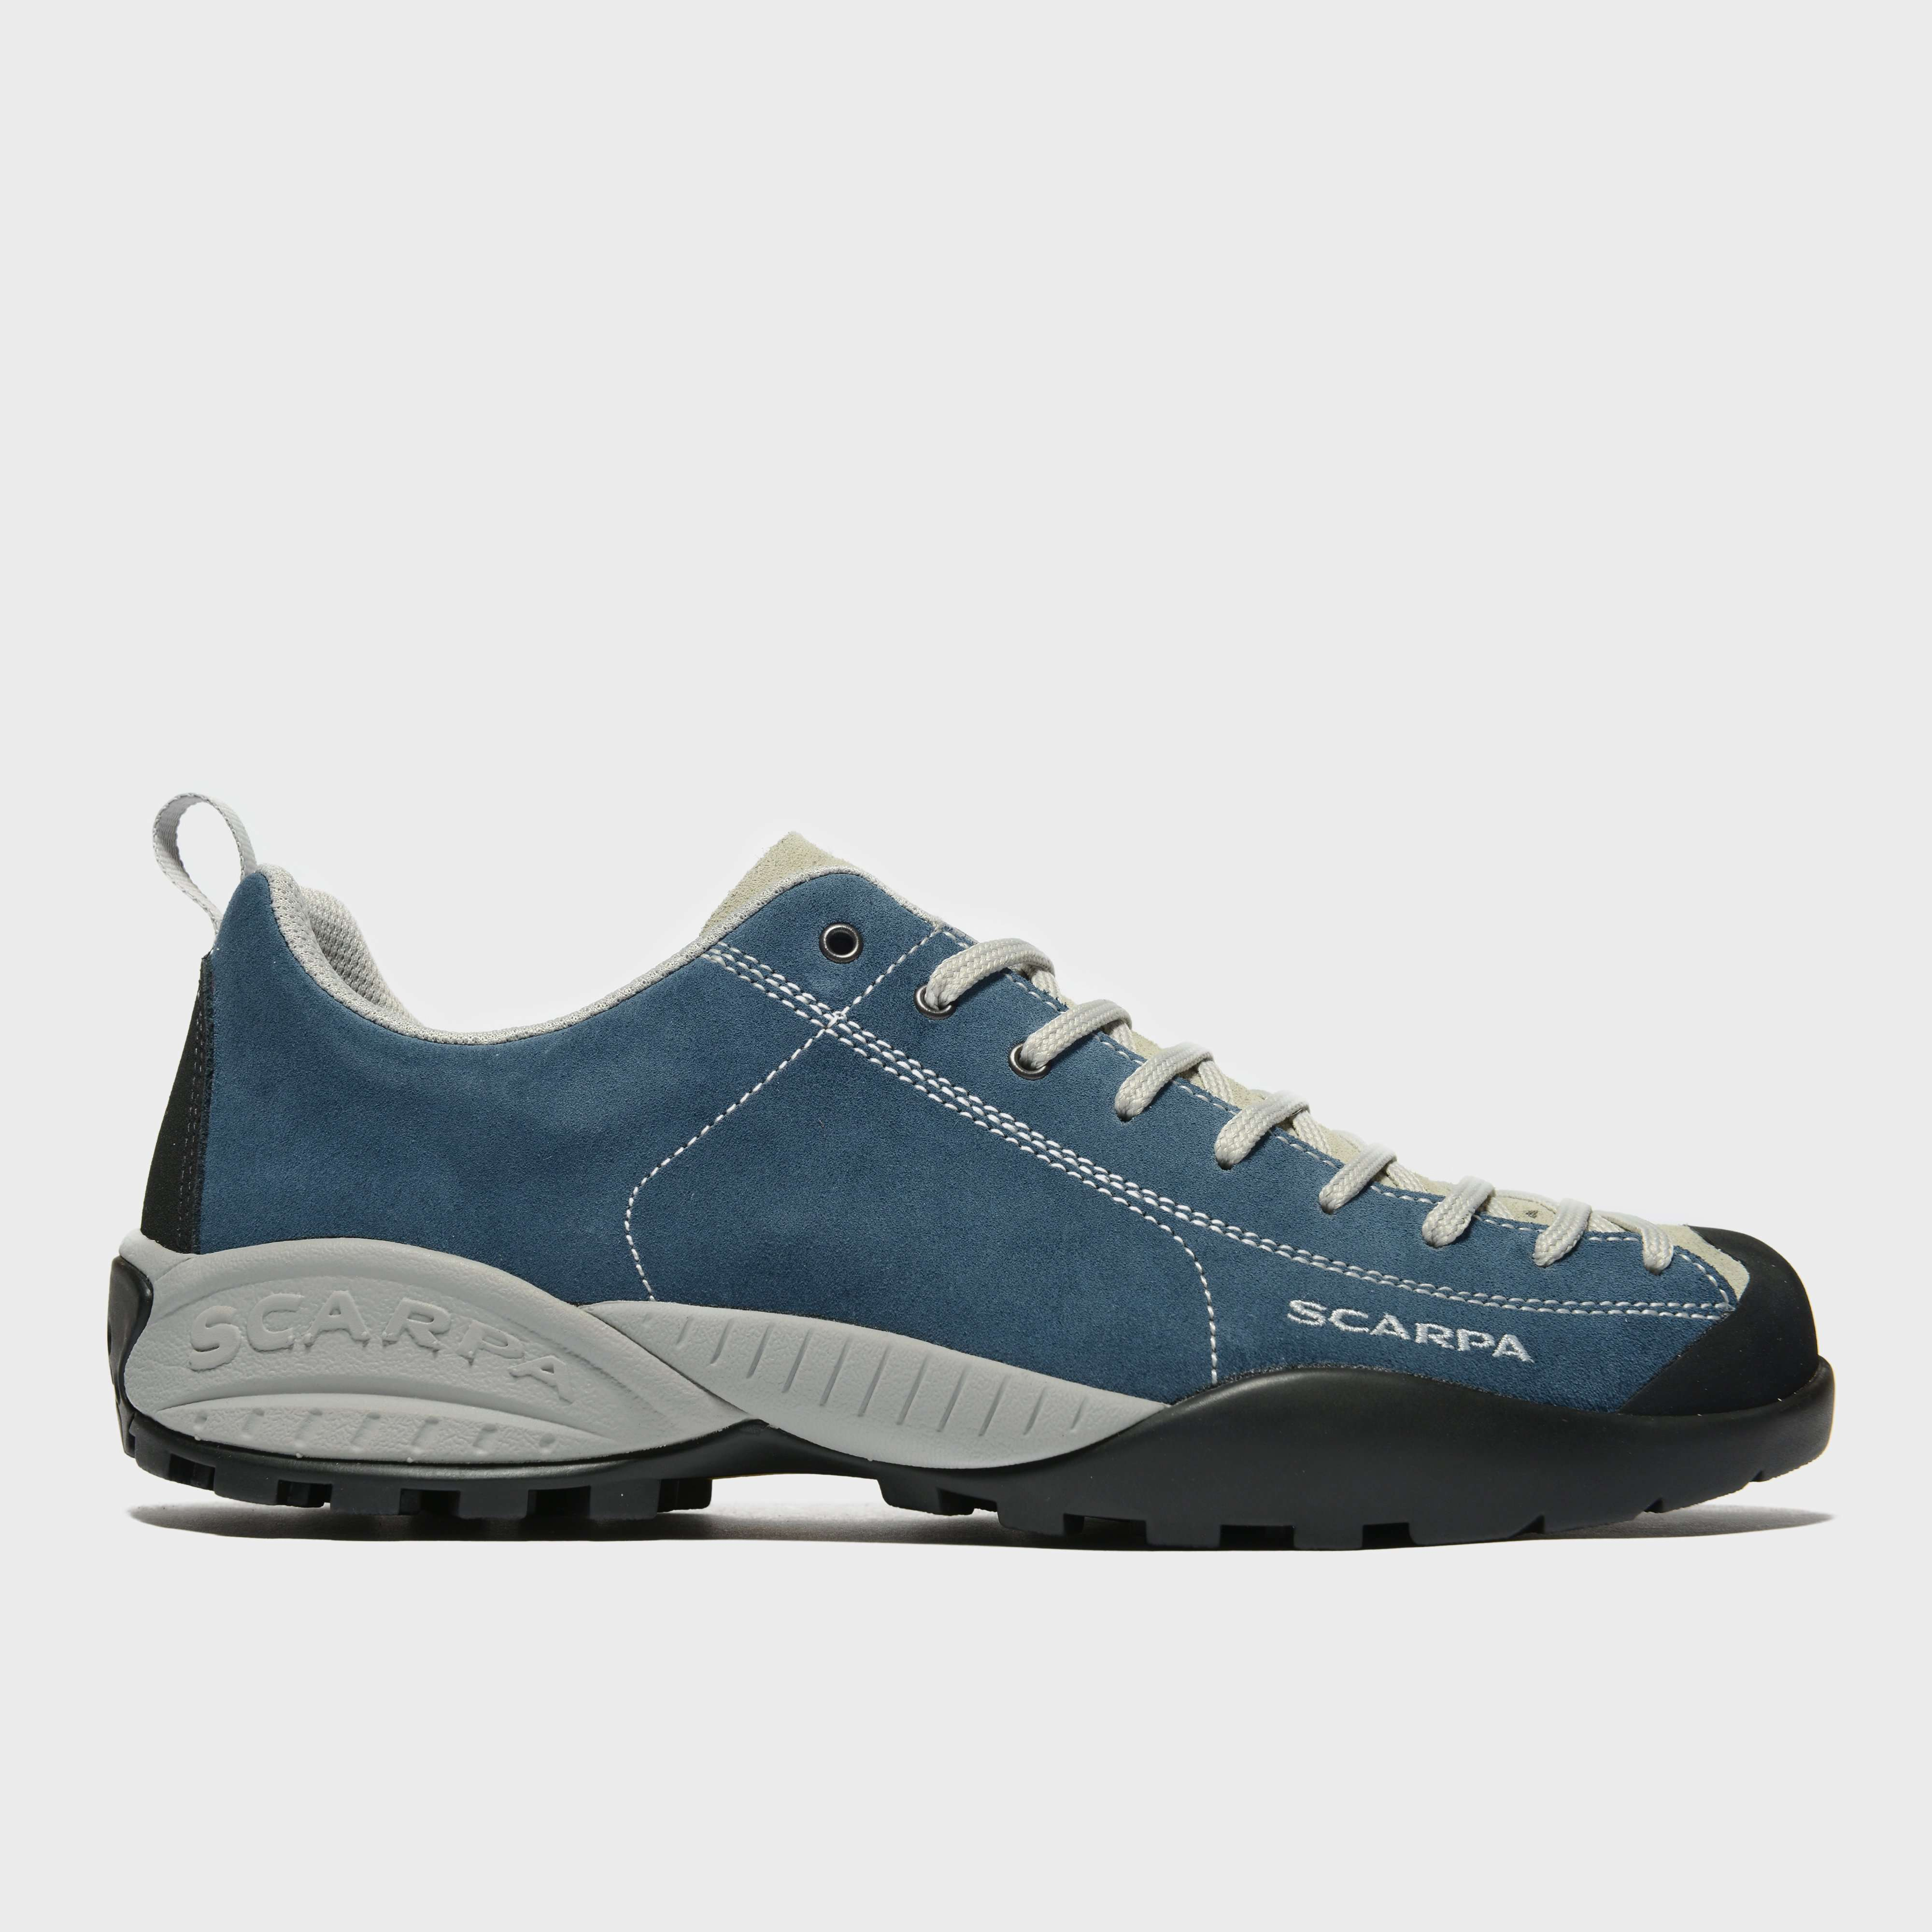 SCARPA Men's Mojito Shoes